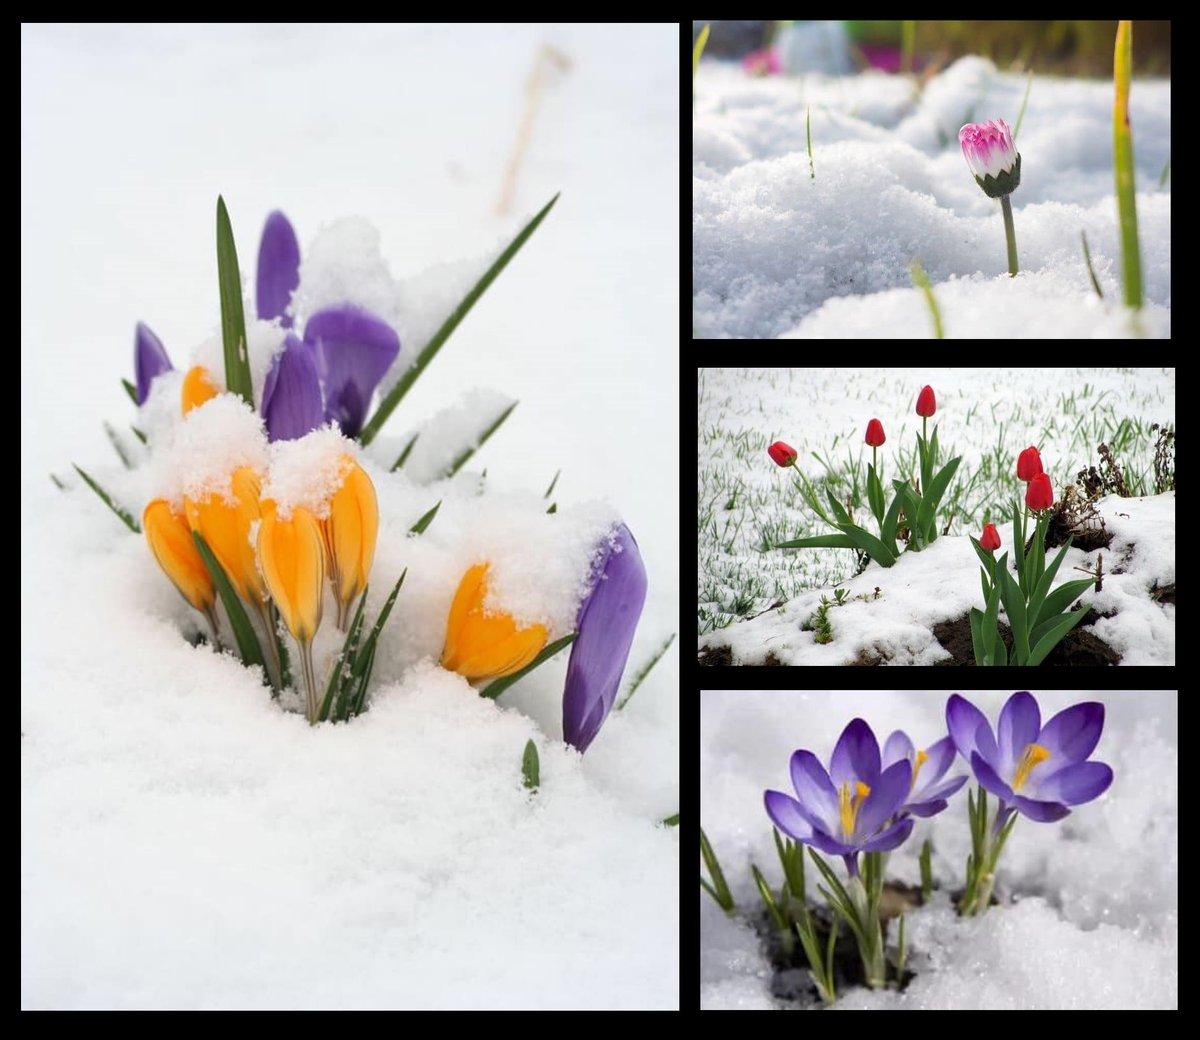 Life endures.   #powerpic #photography  #snow #flowers #colours